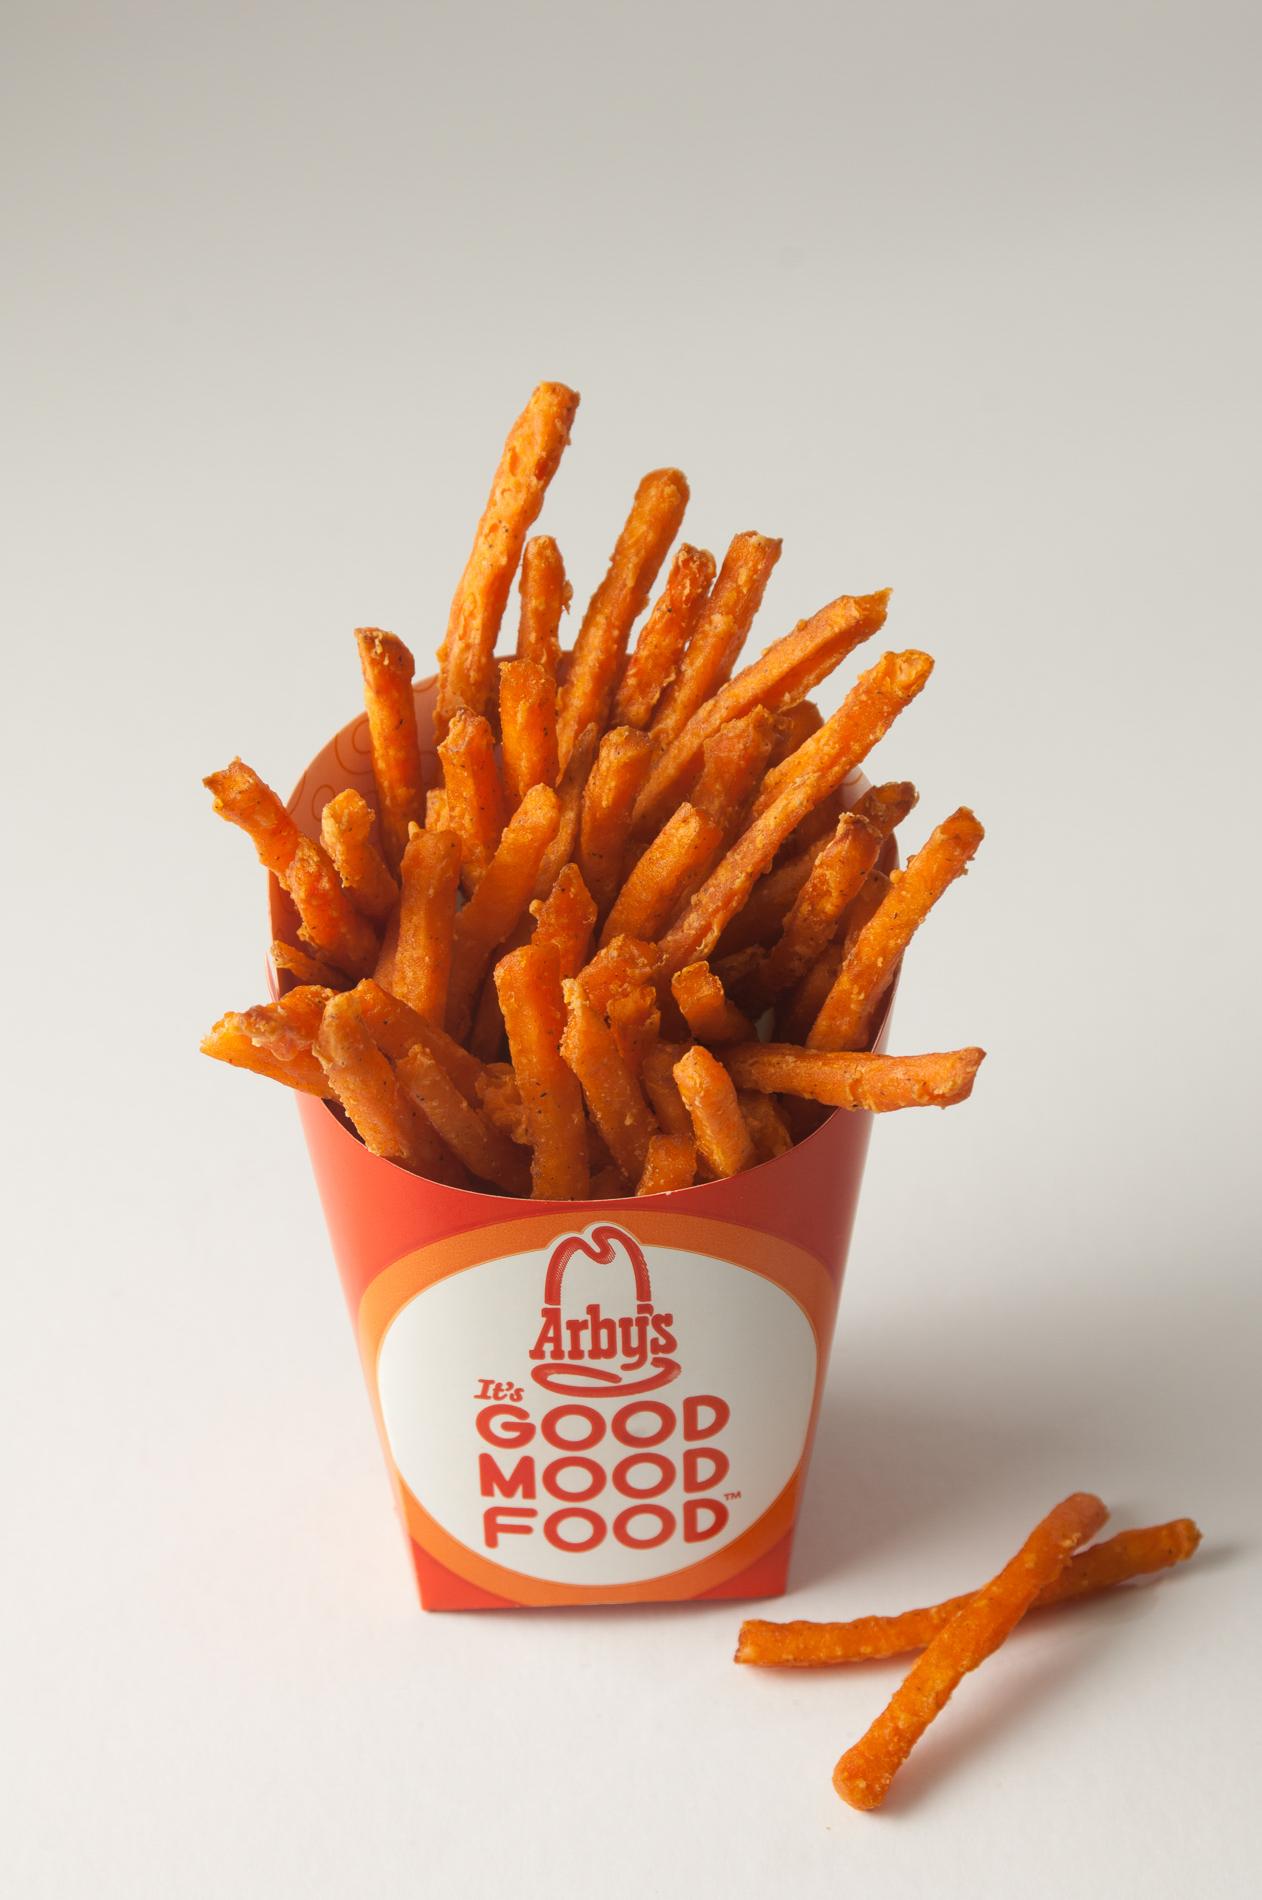 Arby's Sweet Potato Fries